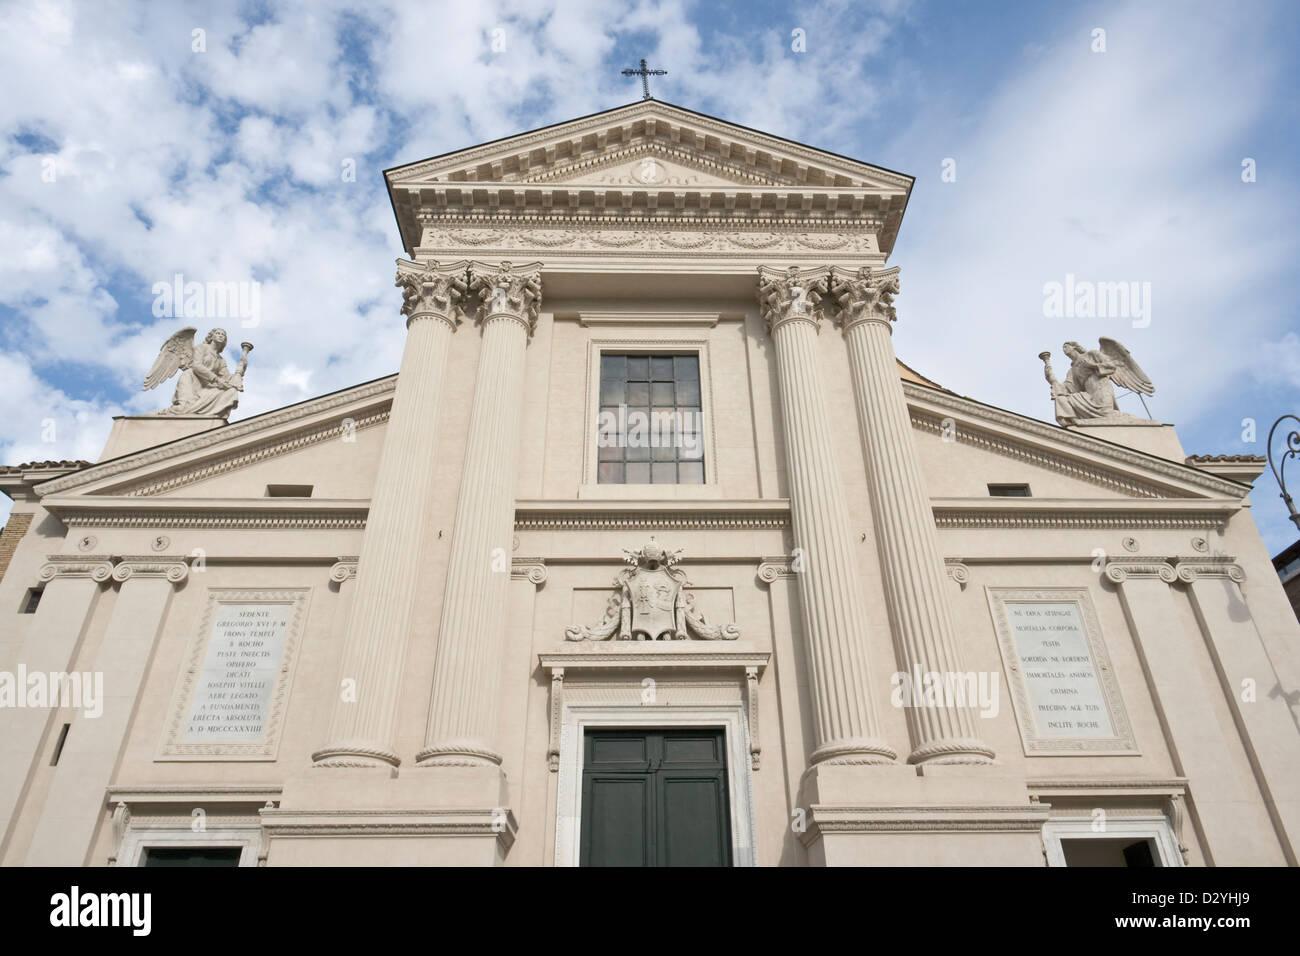 San Rocco church, Rome Stock Photo